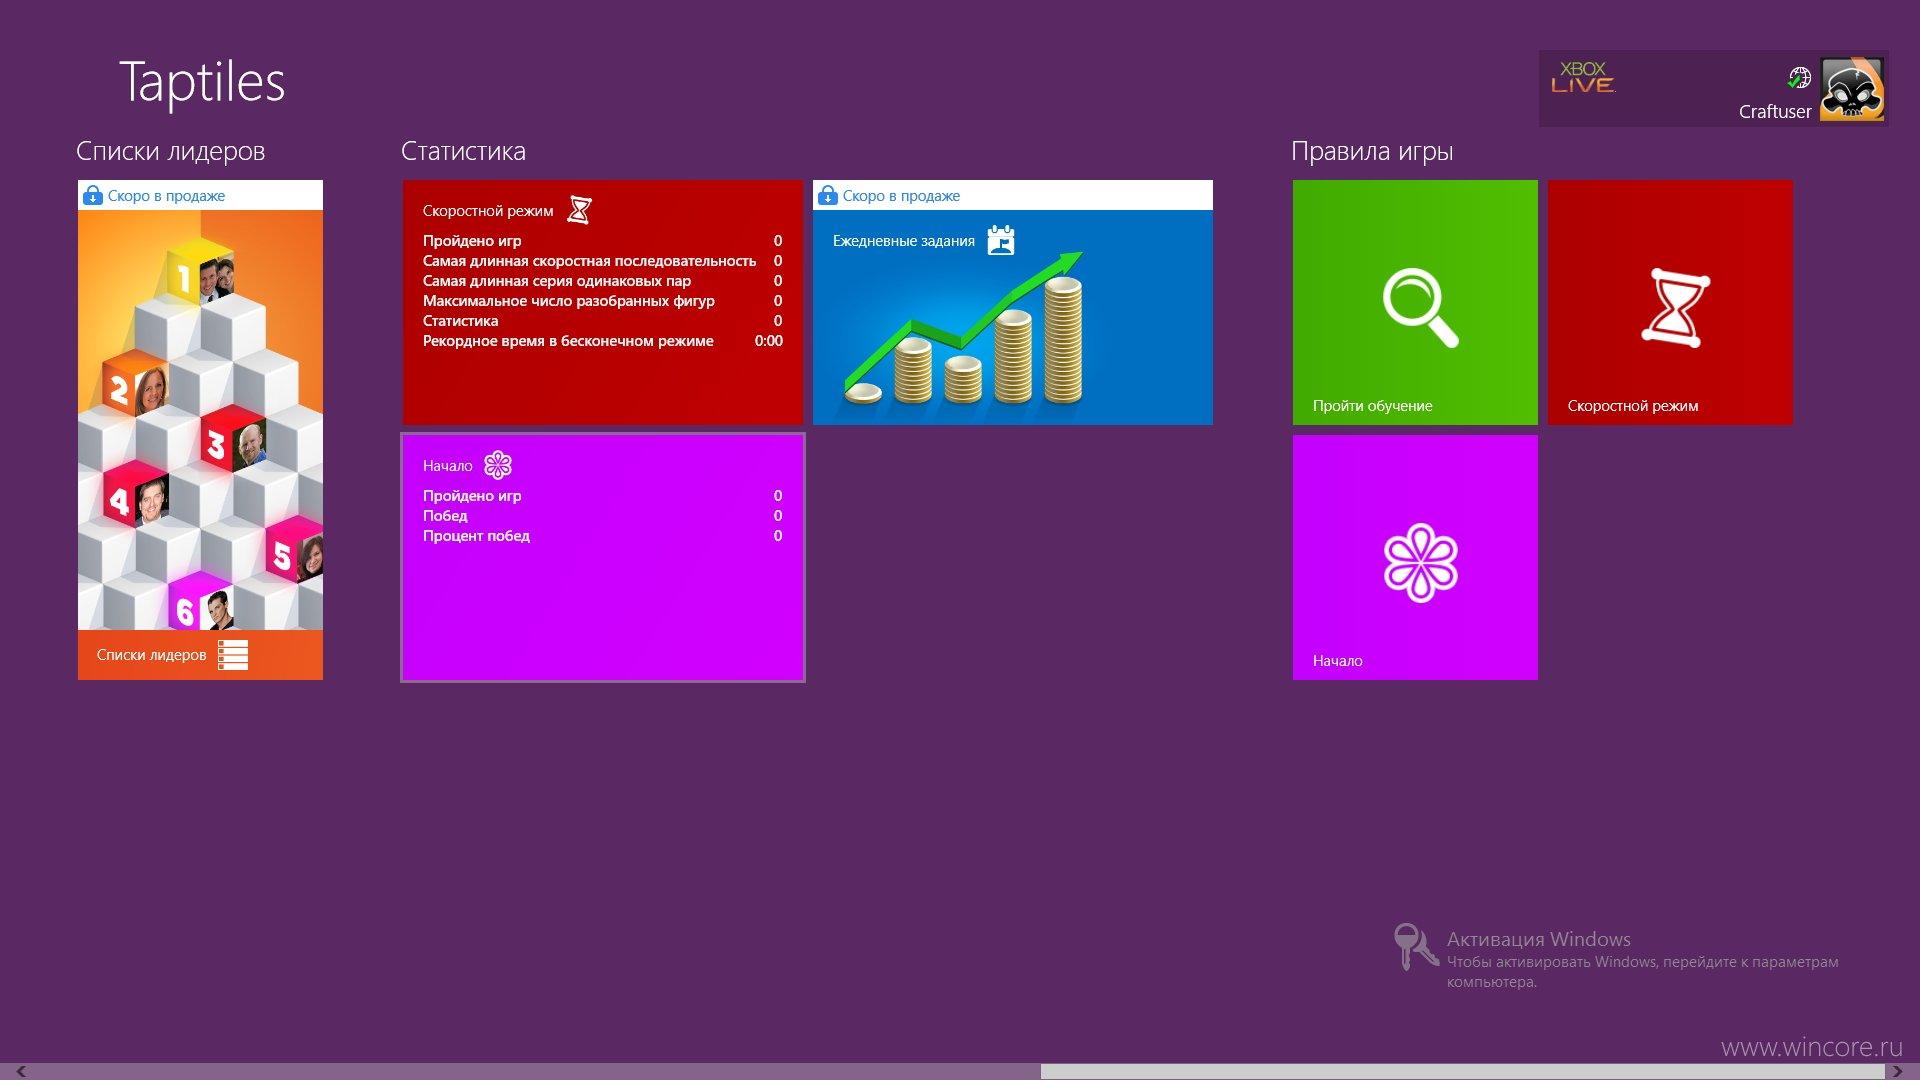 Taptiles Для Windows 7